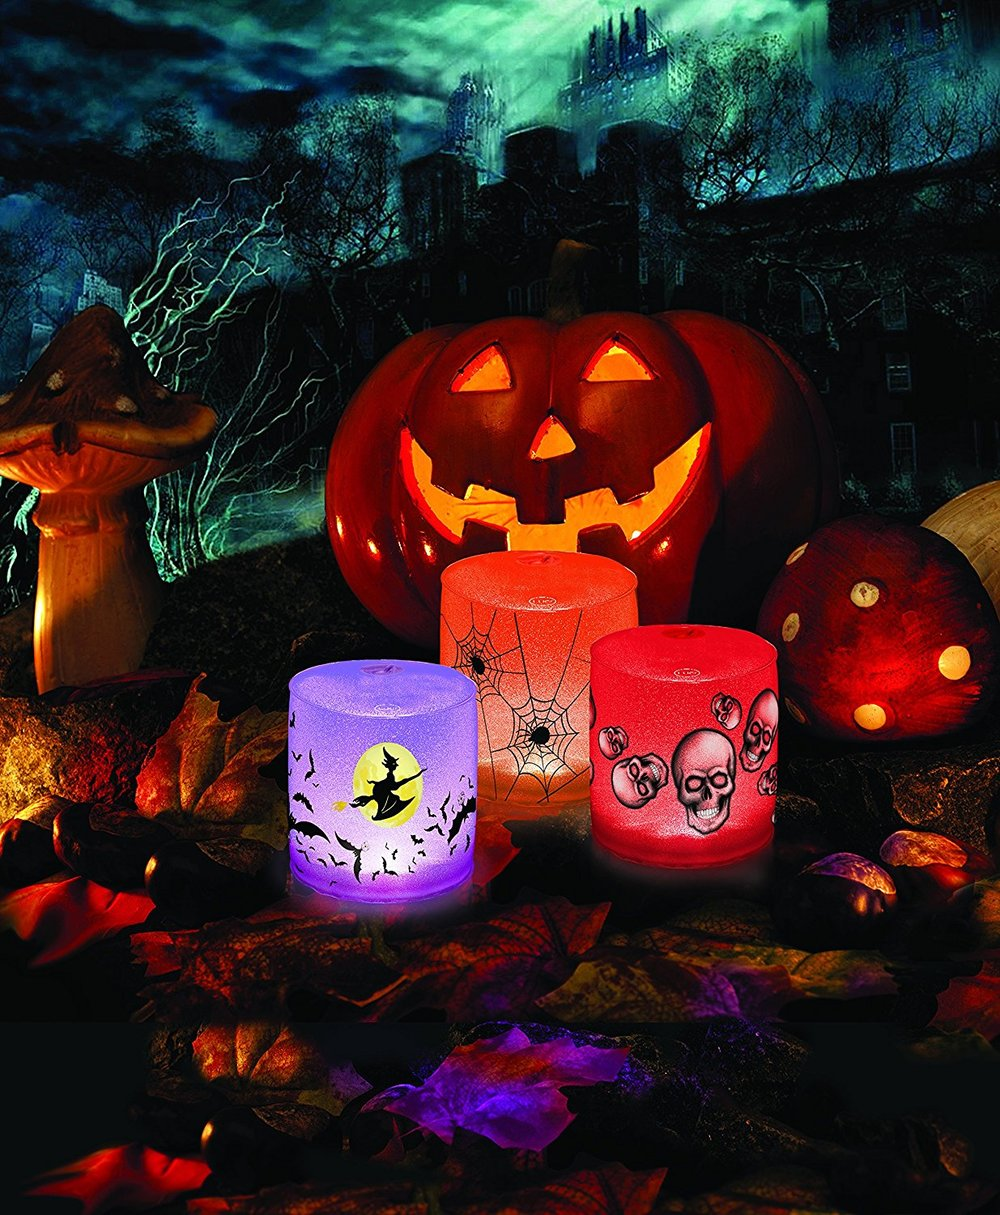 Hallowen lights, Luci lantern, Luci light, Halloween decorations, Halloween lanterns, Halloween lighting